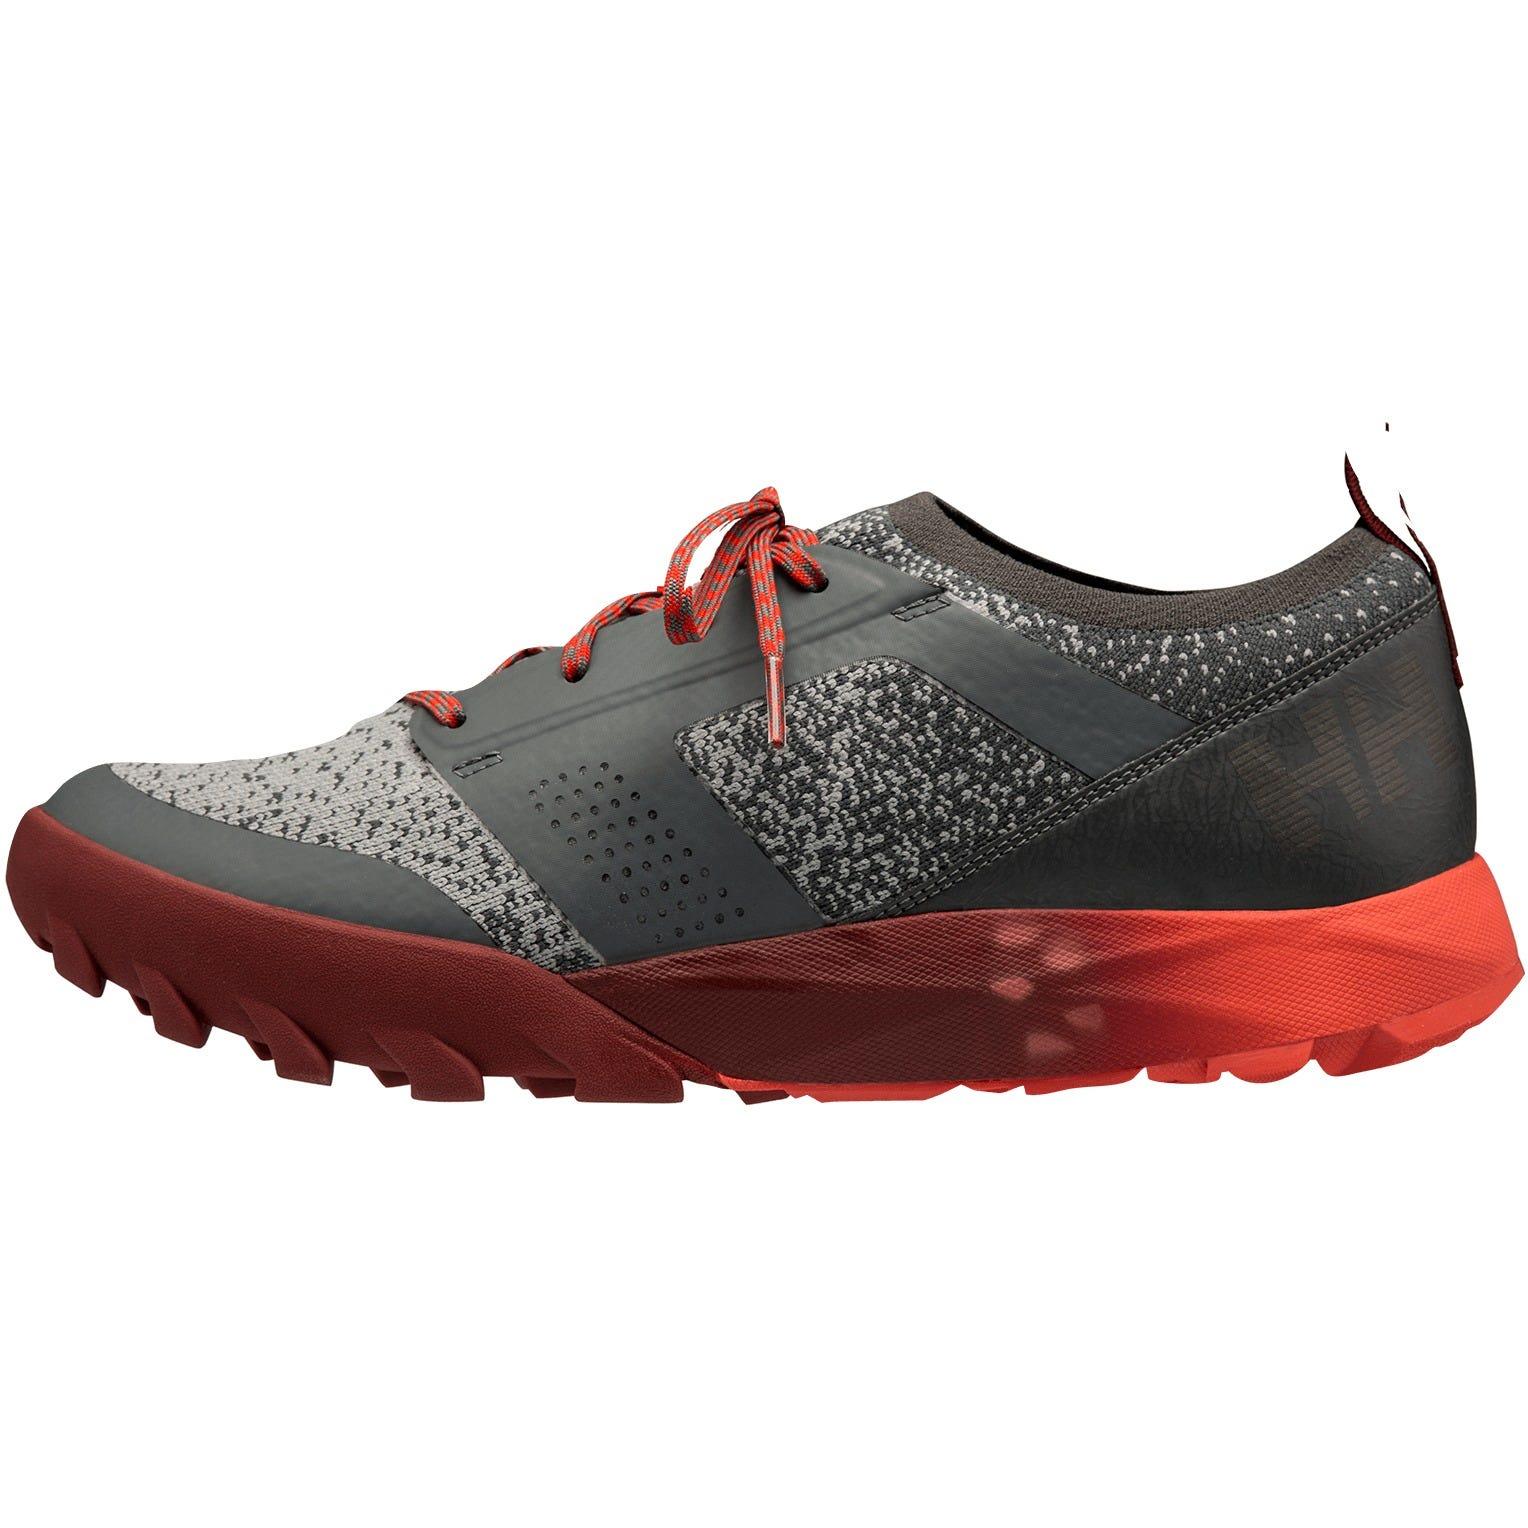 Helly Hansen Loke Dash Mens Hiking Boot Blue 46/11.5